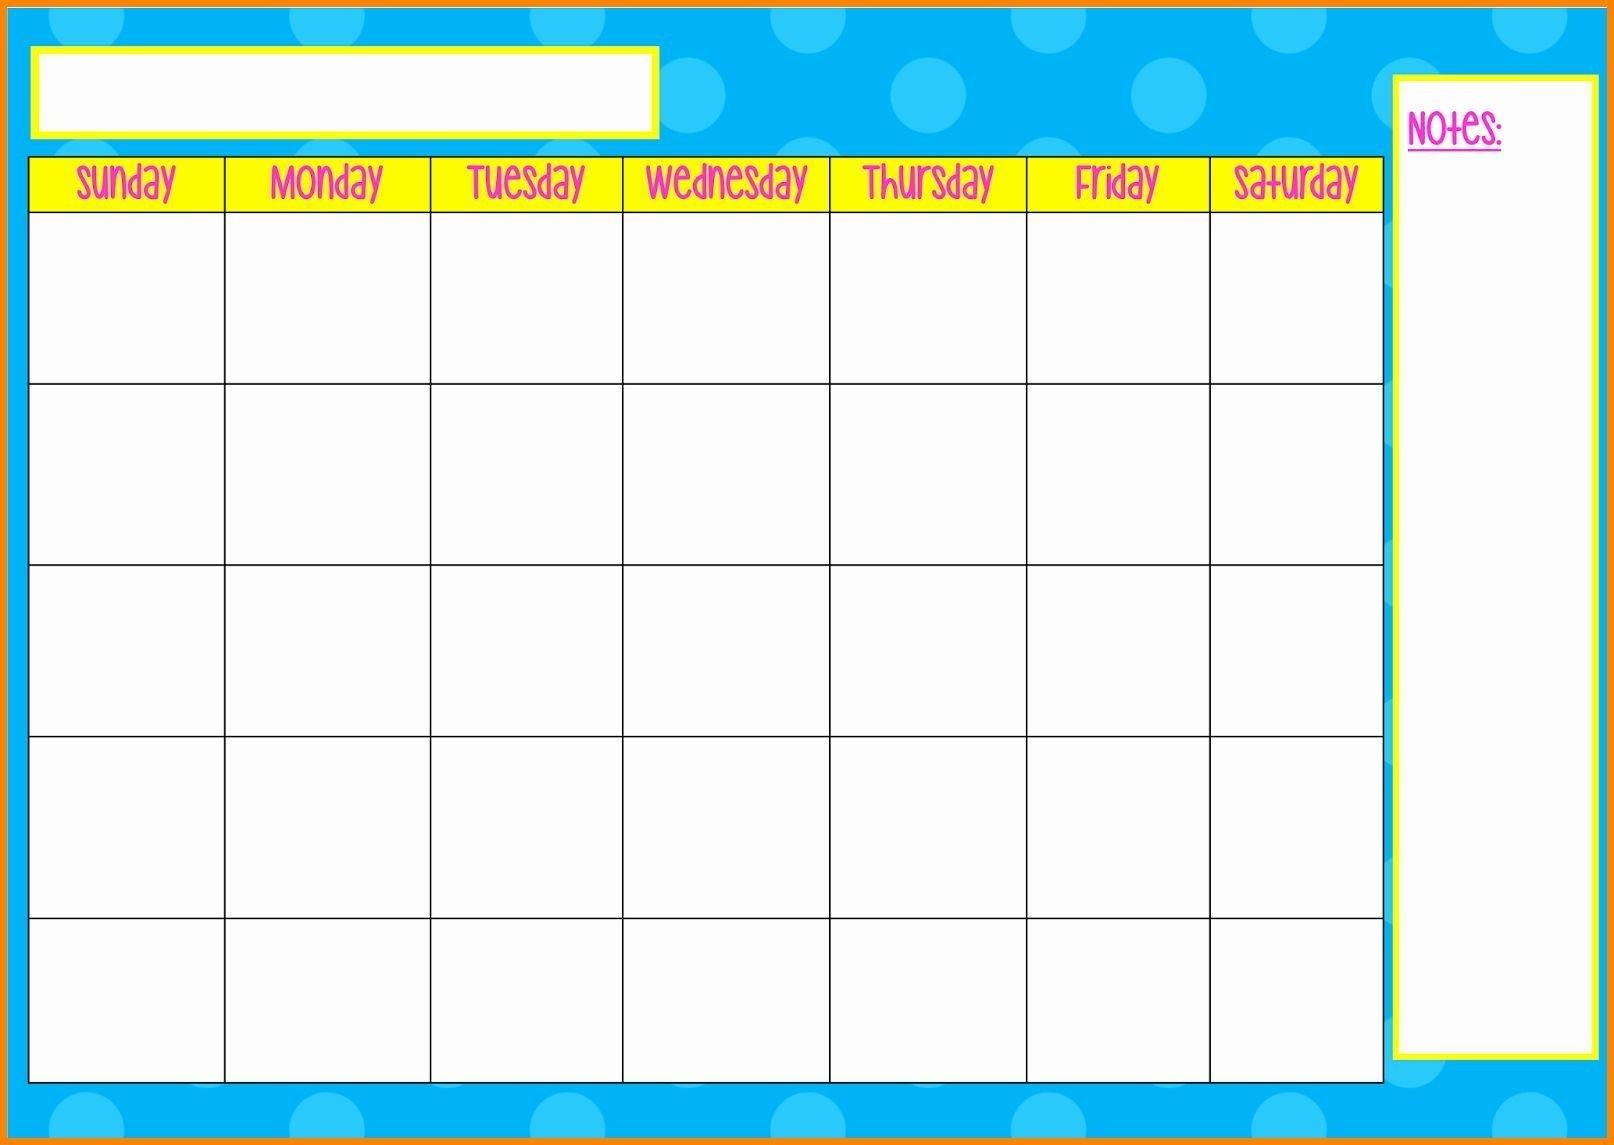 How To Monday Through Friday Calendar Word | Get Your Monday Through Friday Calendar Printable